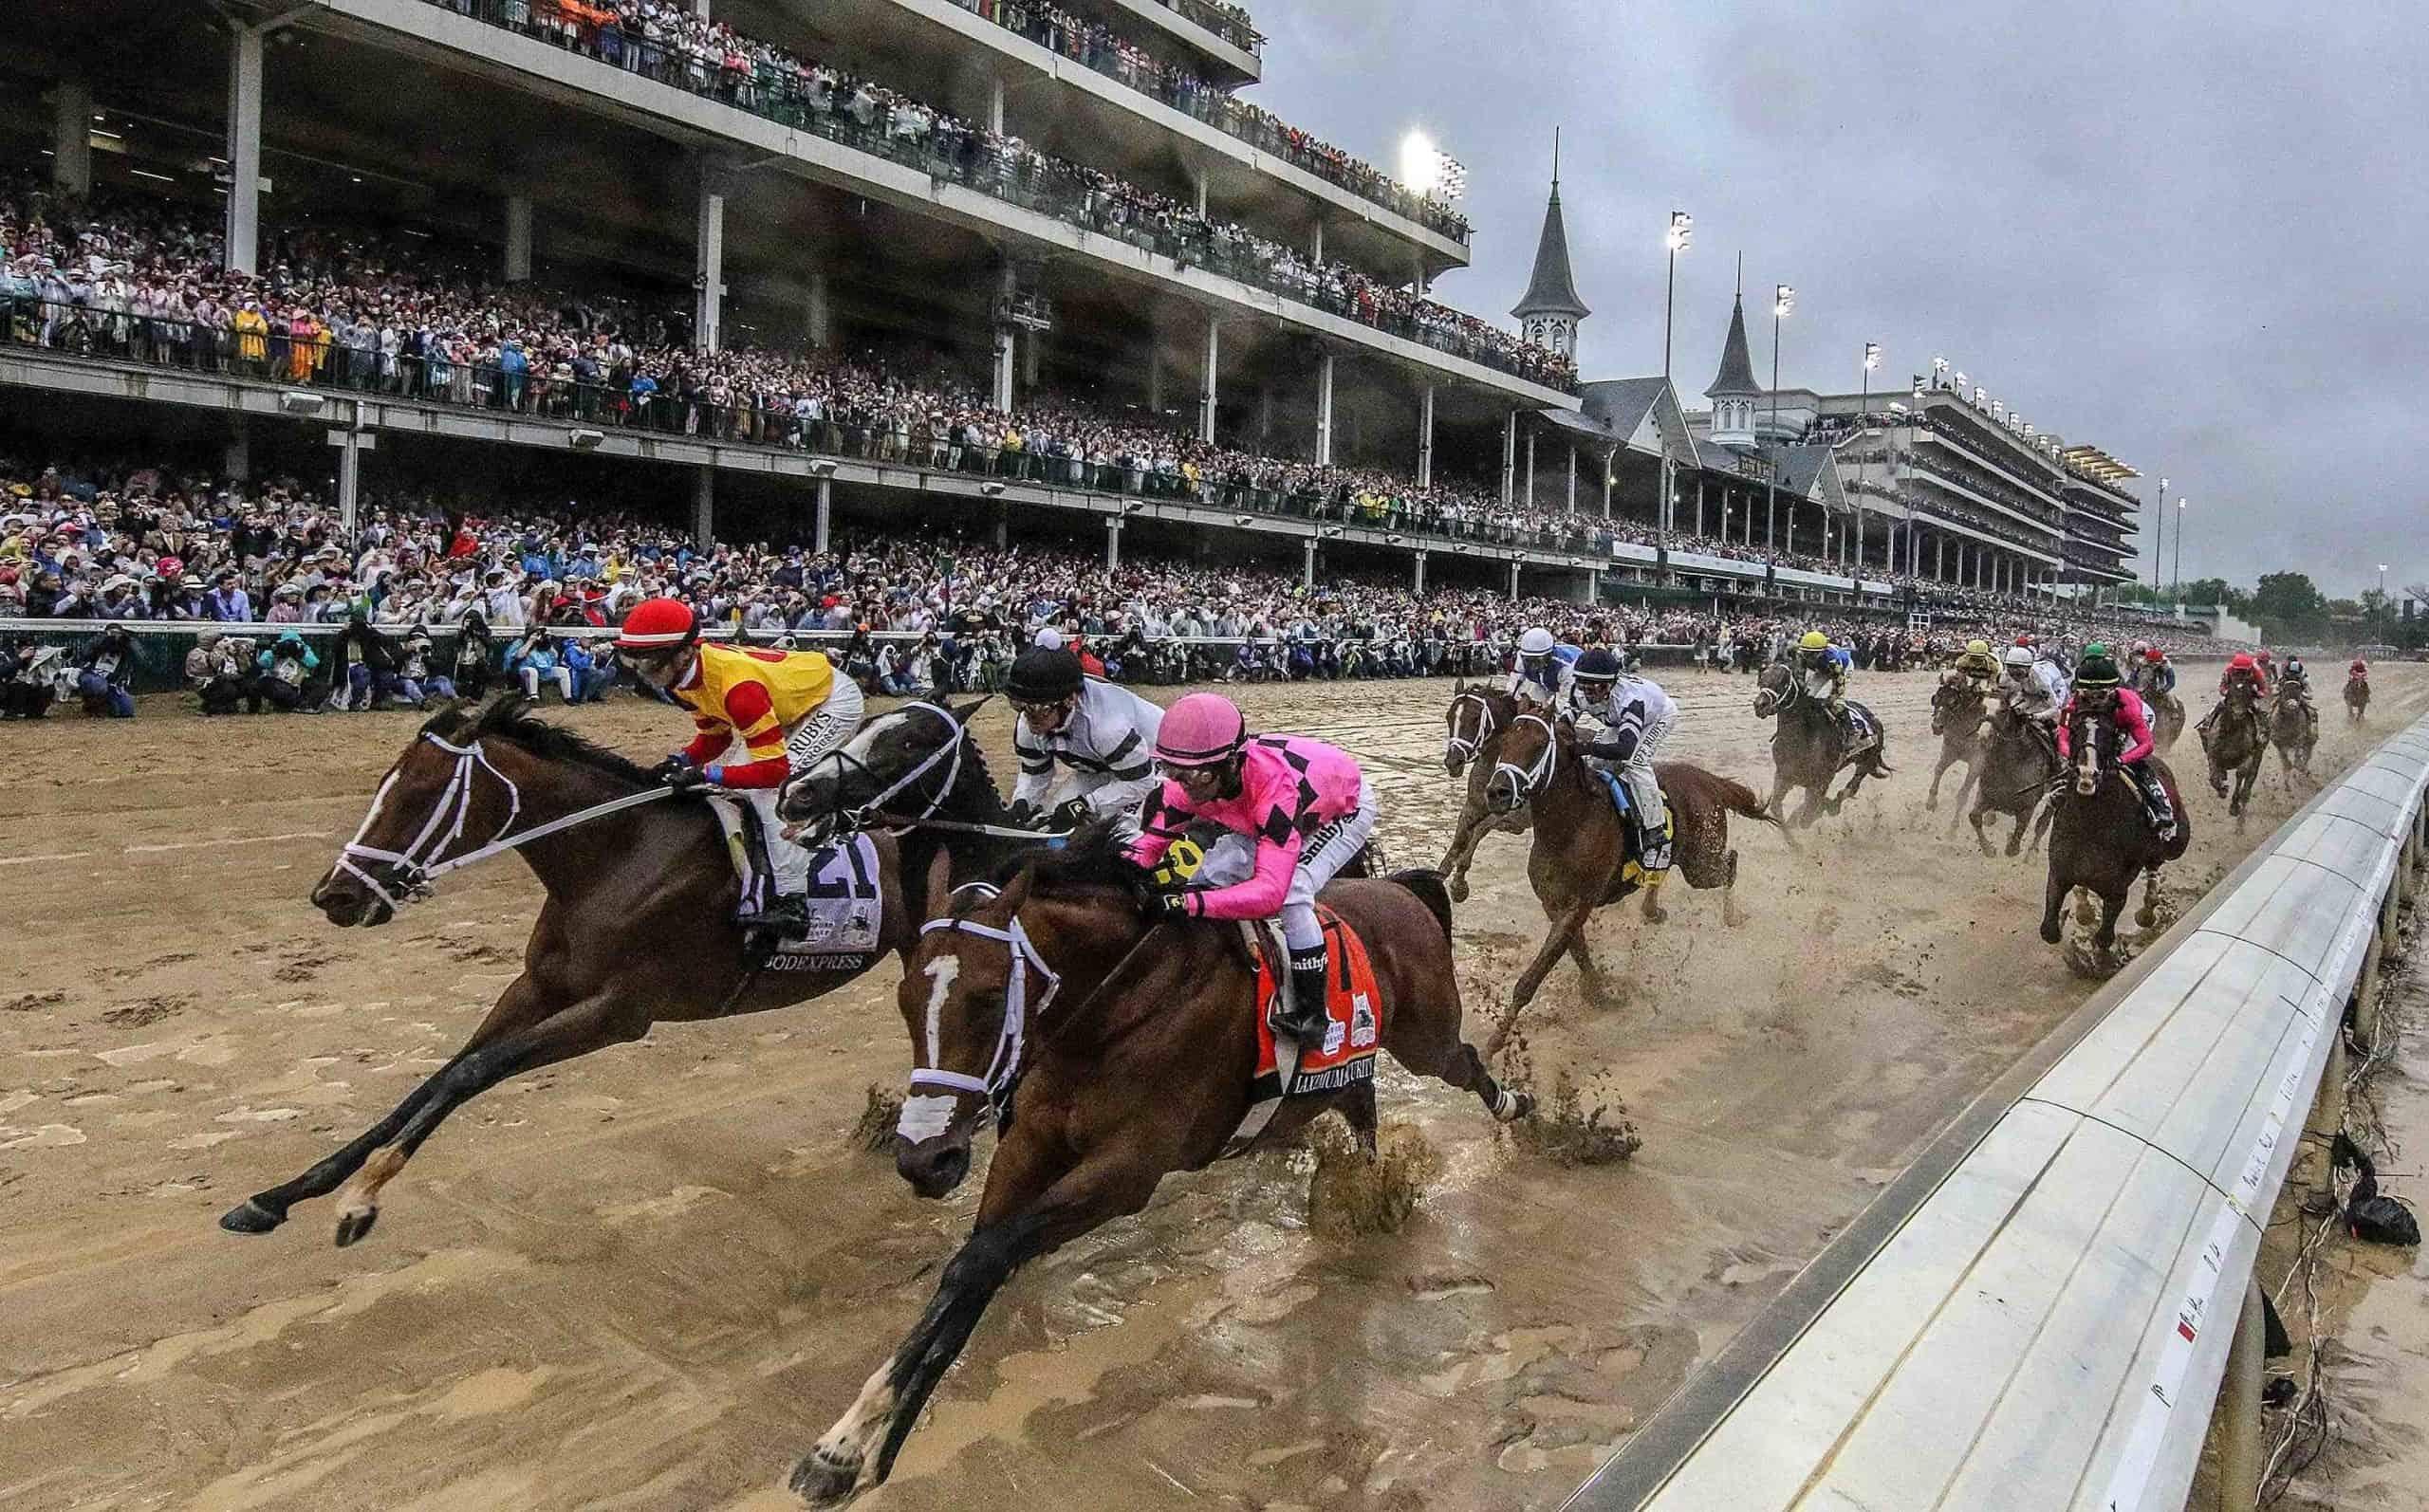 Virtual Kentucky Derby' To Be Broadcast on NBC   SportsInsider.com